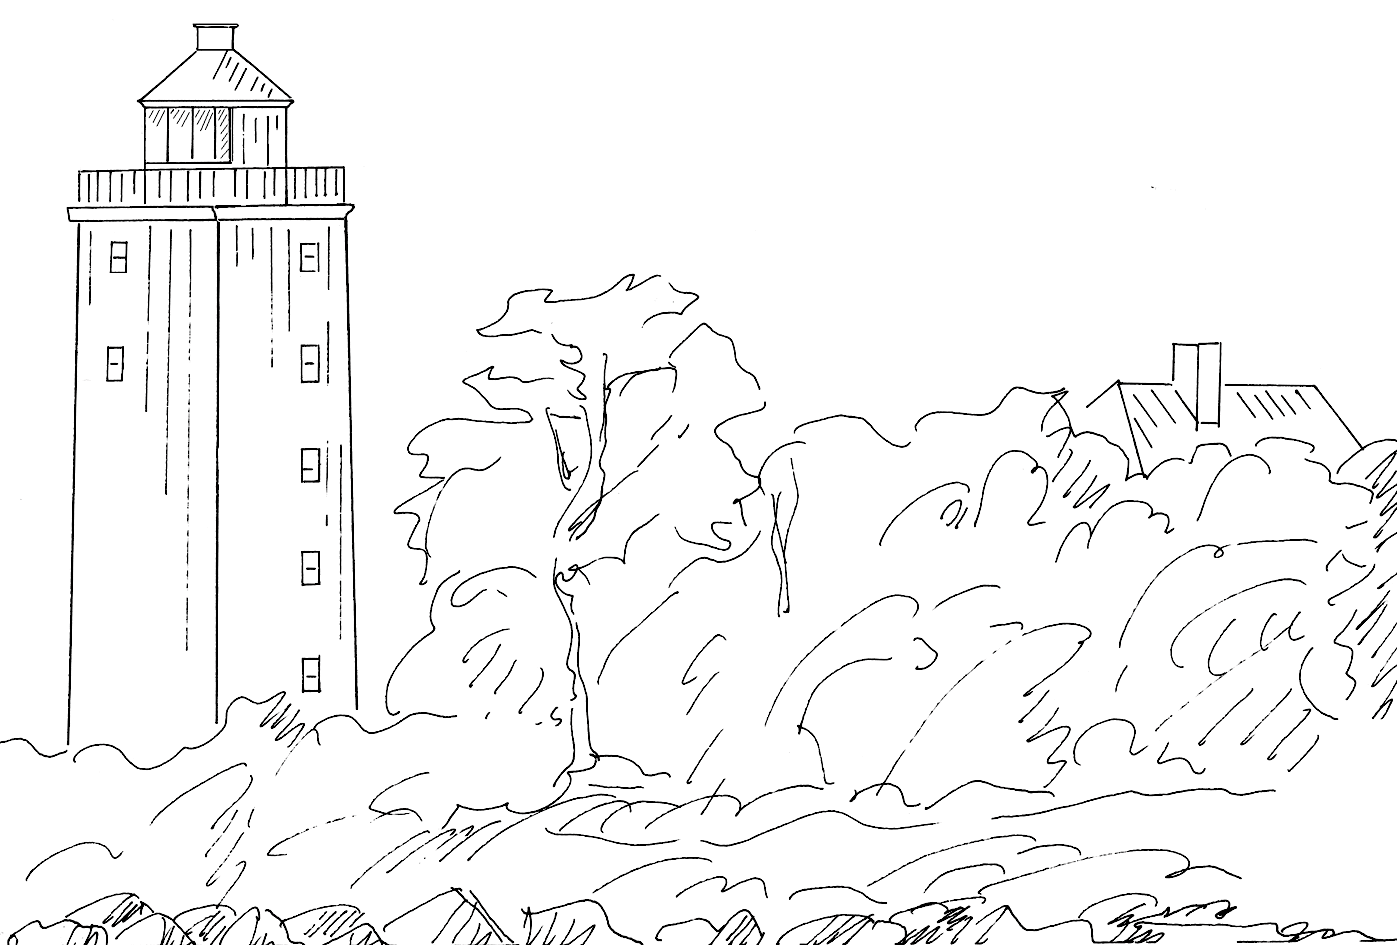 Svaneke - Lighthouse près de Svaneke